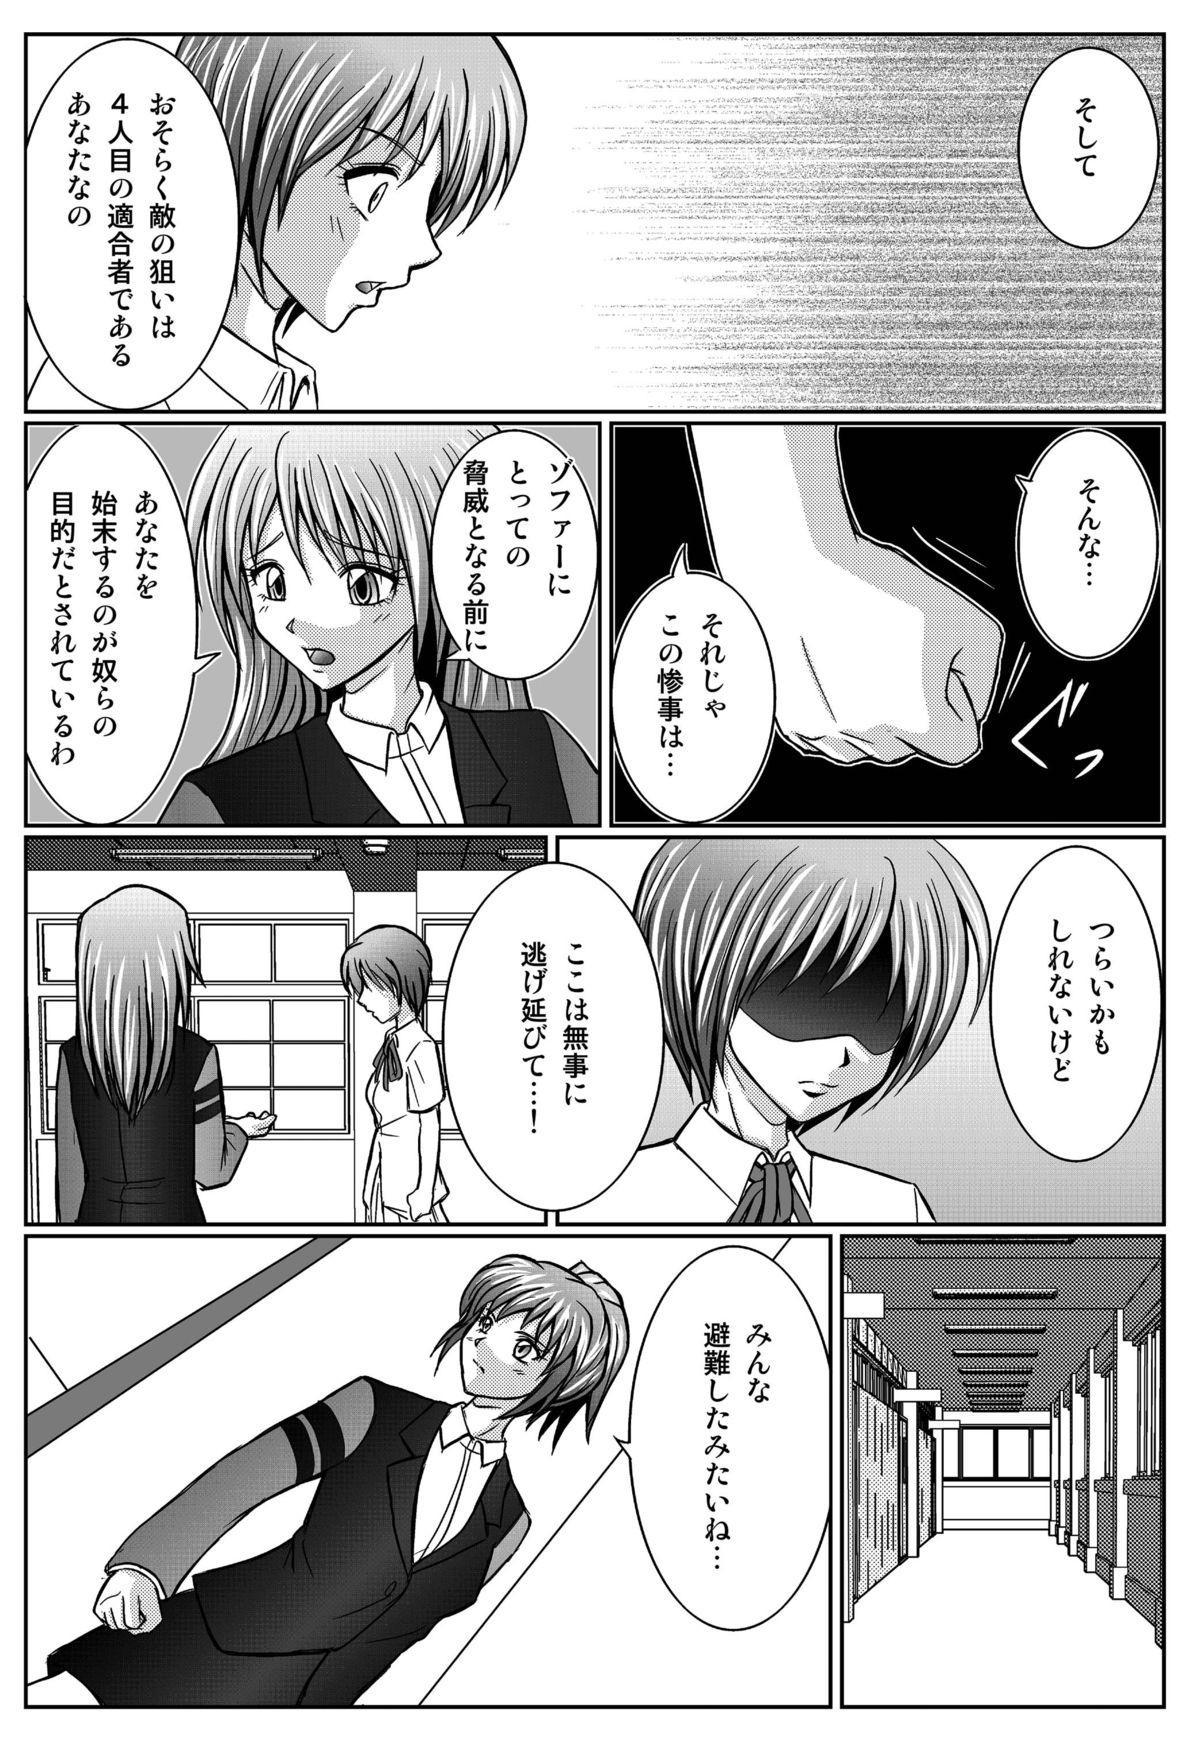 [Macxe's (monmon)] Tokubousentai Dinaranger ~Heroine Kairaku Sennou Keikaku~ Vol.01/02/03 (Renkaban) [Digital] 134